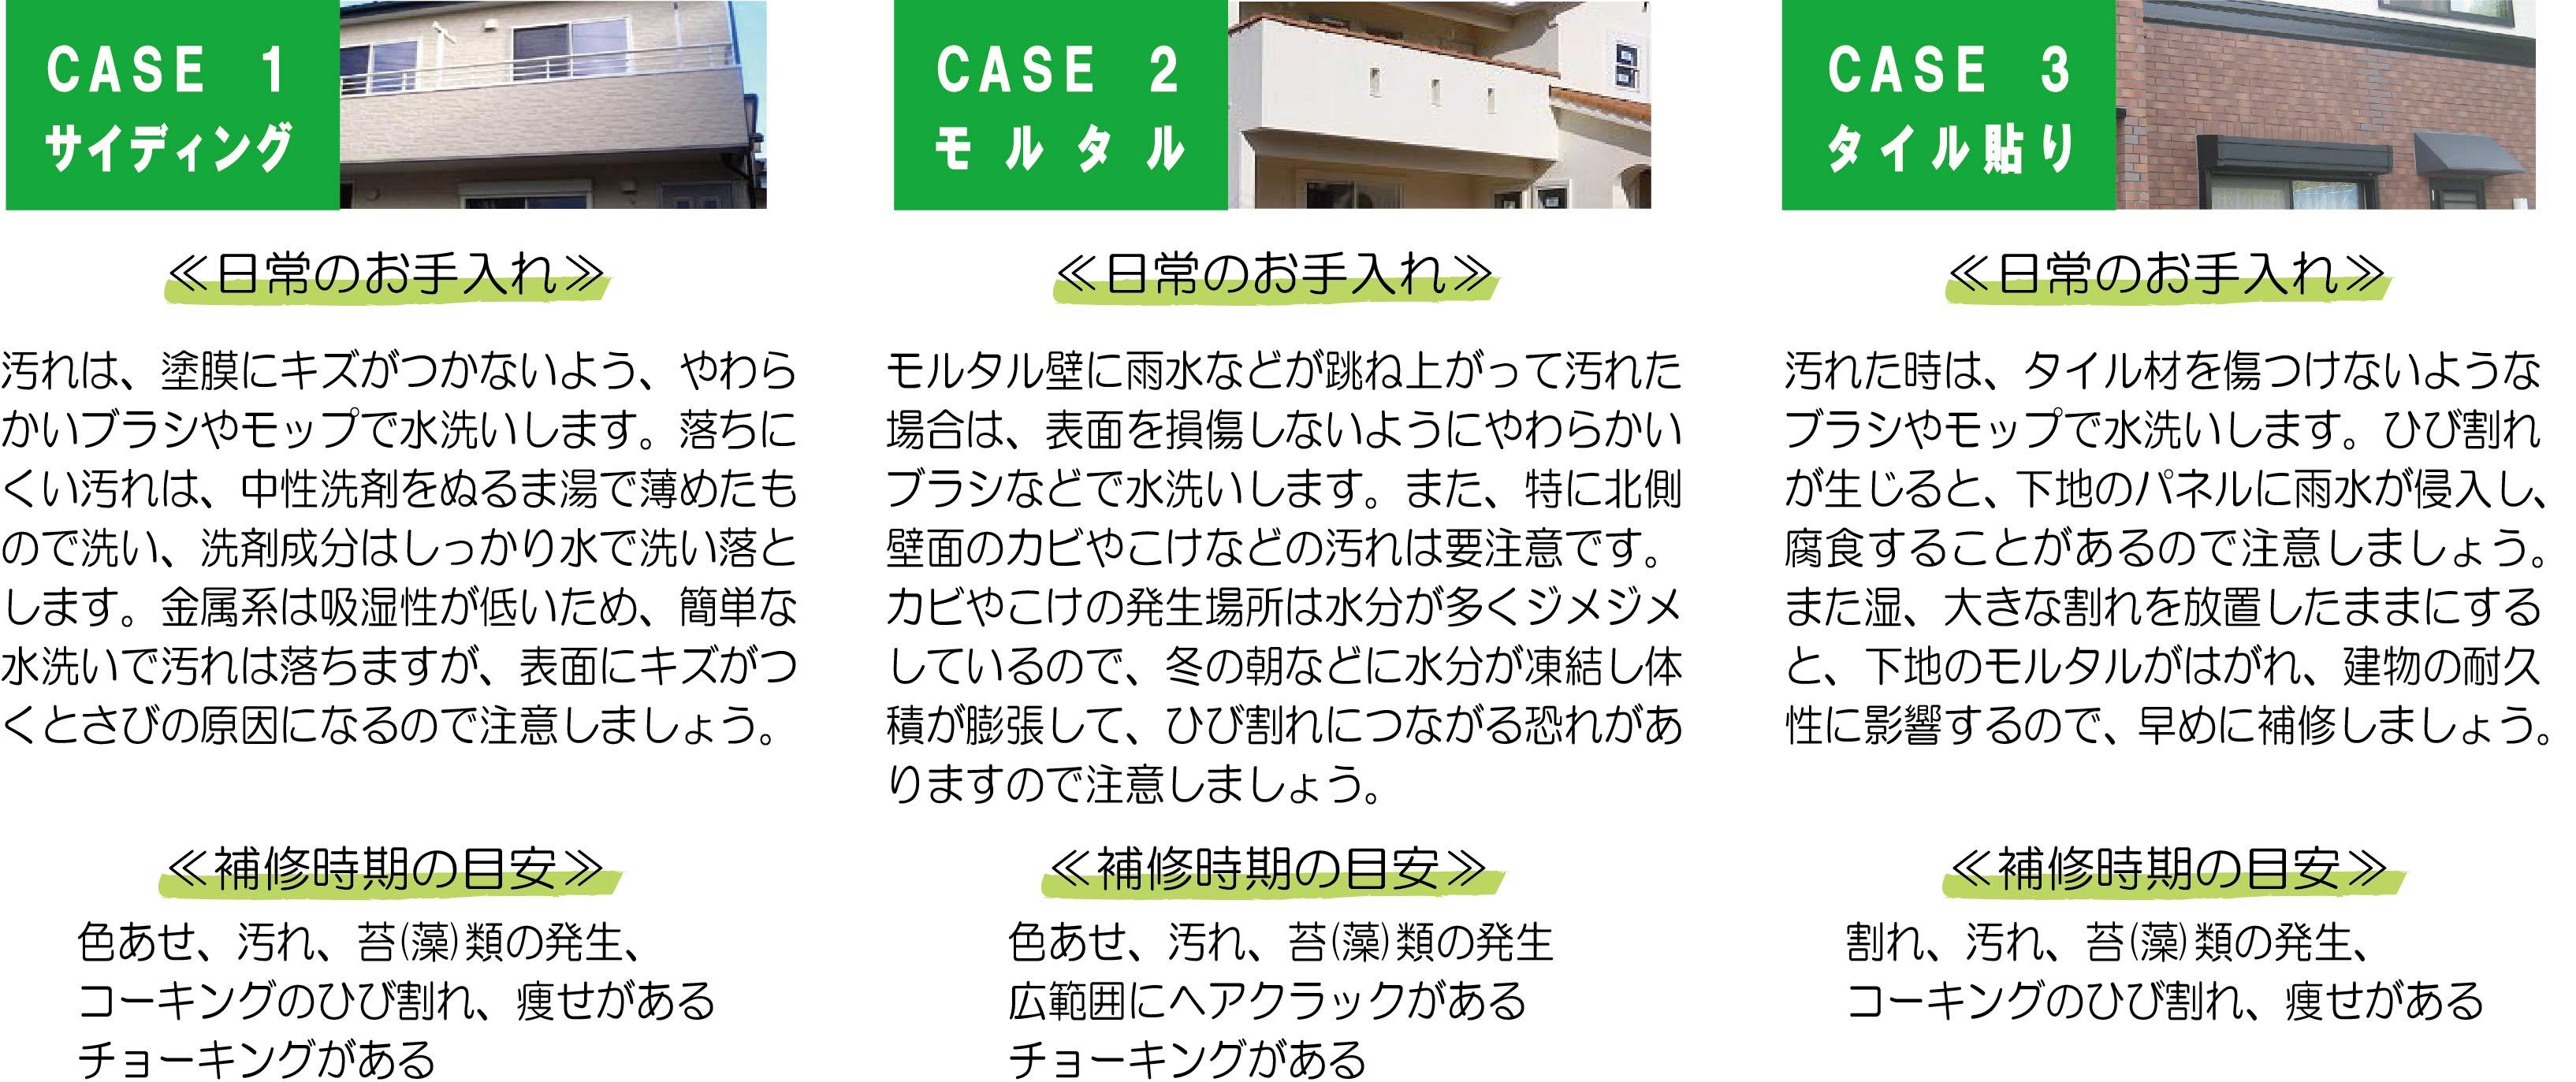 KuraSi-natu-sin83-17.jpg